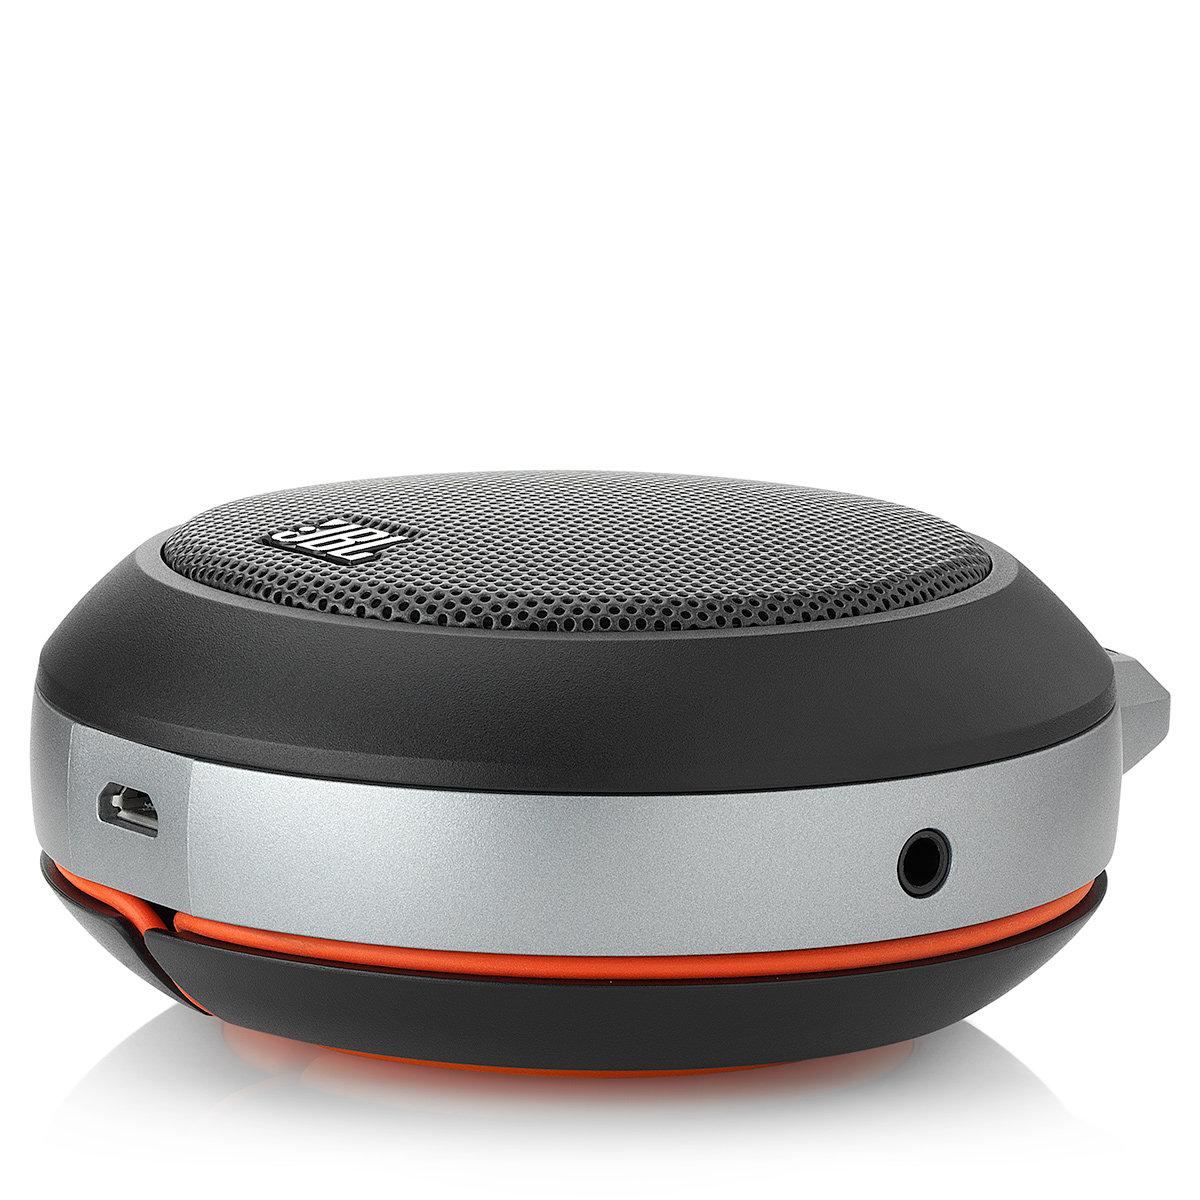 Amazon.com: JBL Micro II Ultra-Portable Multimedia Speaker (Black